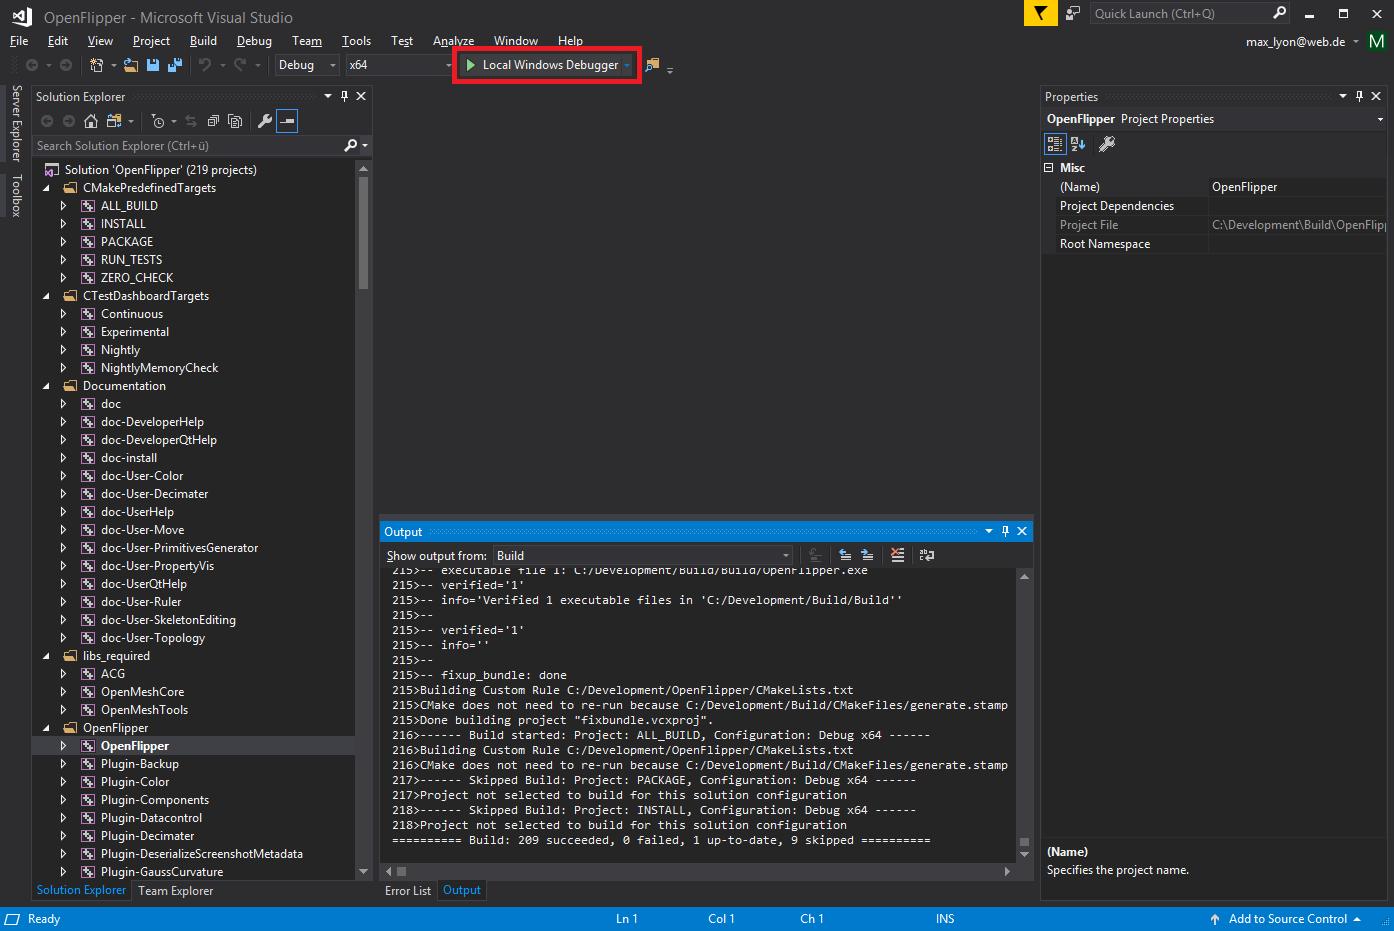 Documentation/DeveloperHelpSources/building-screenshots/17_local_windows_debugger.png